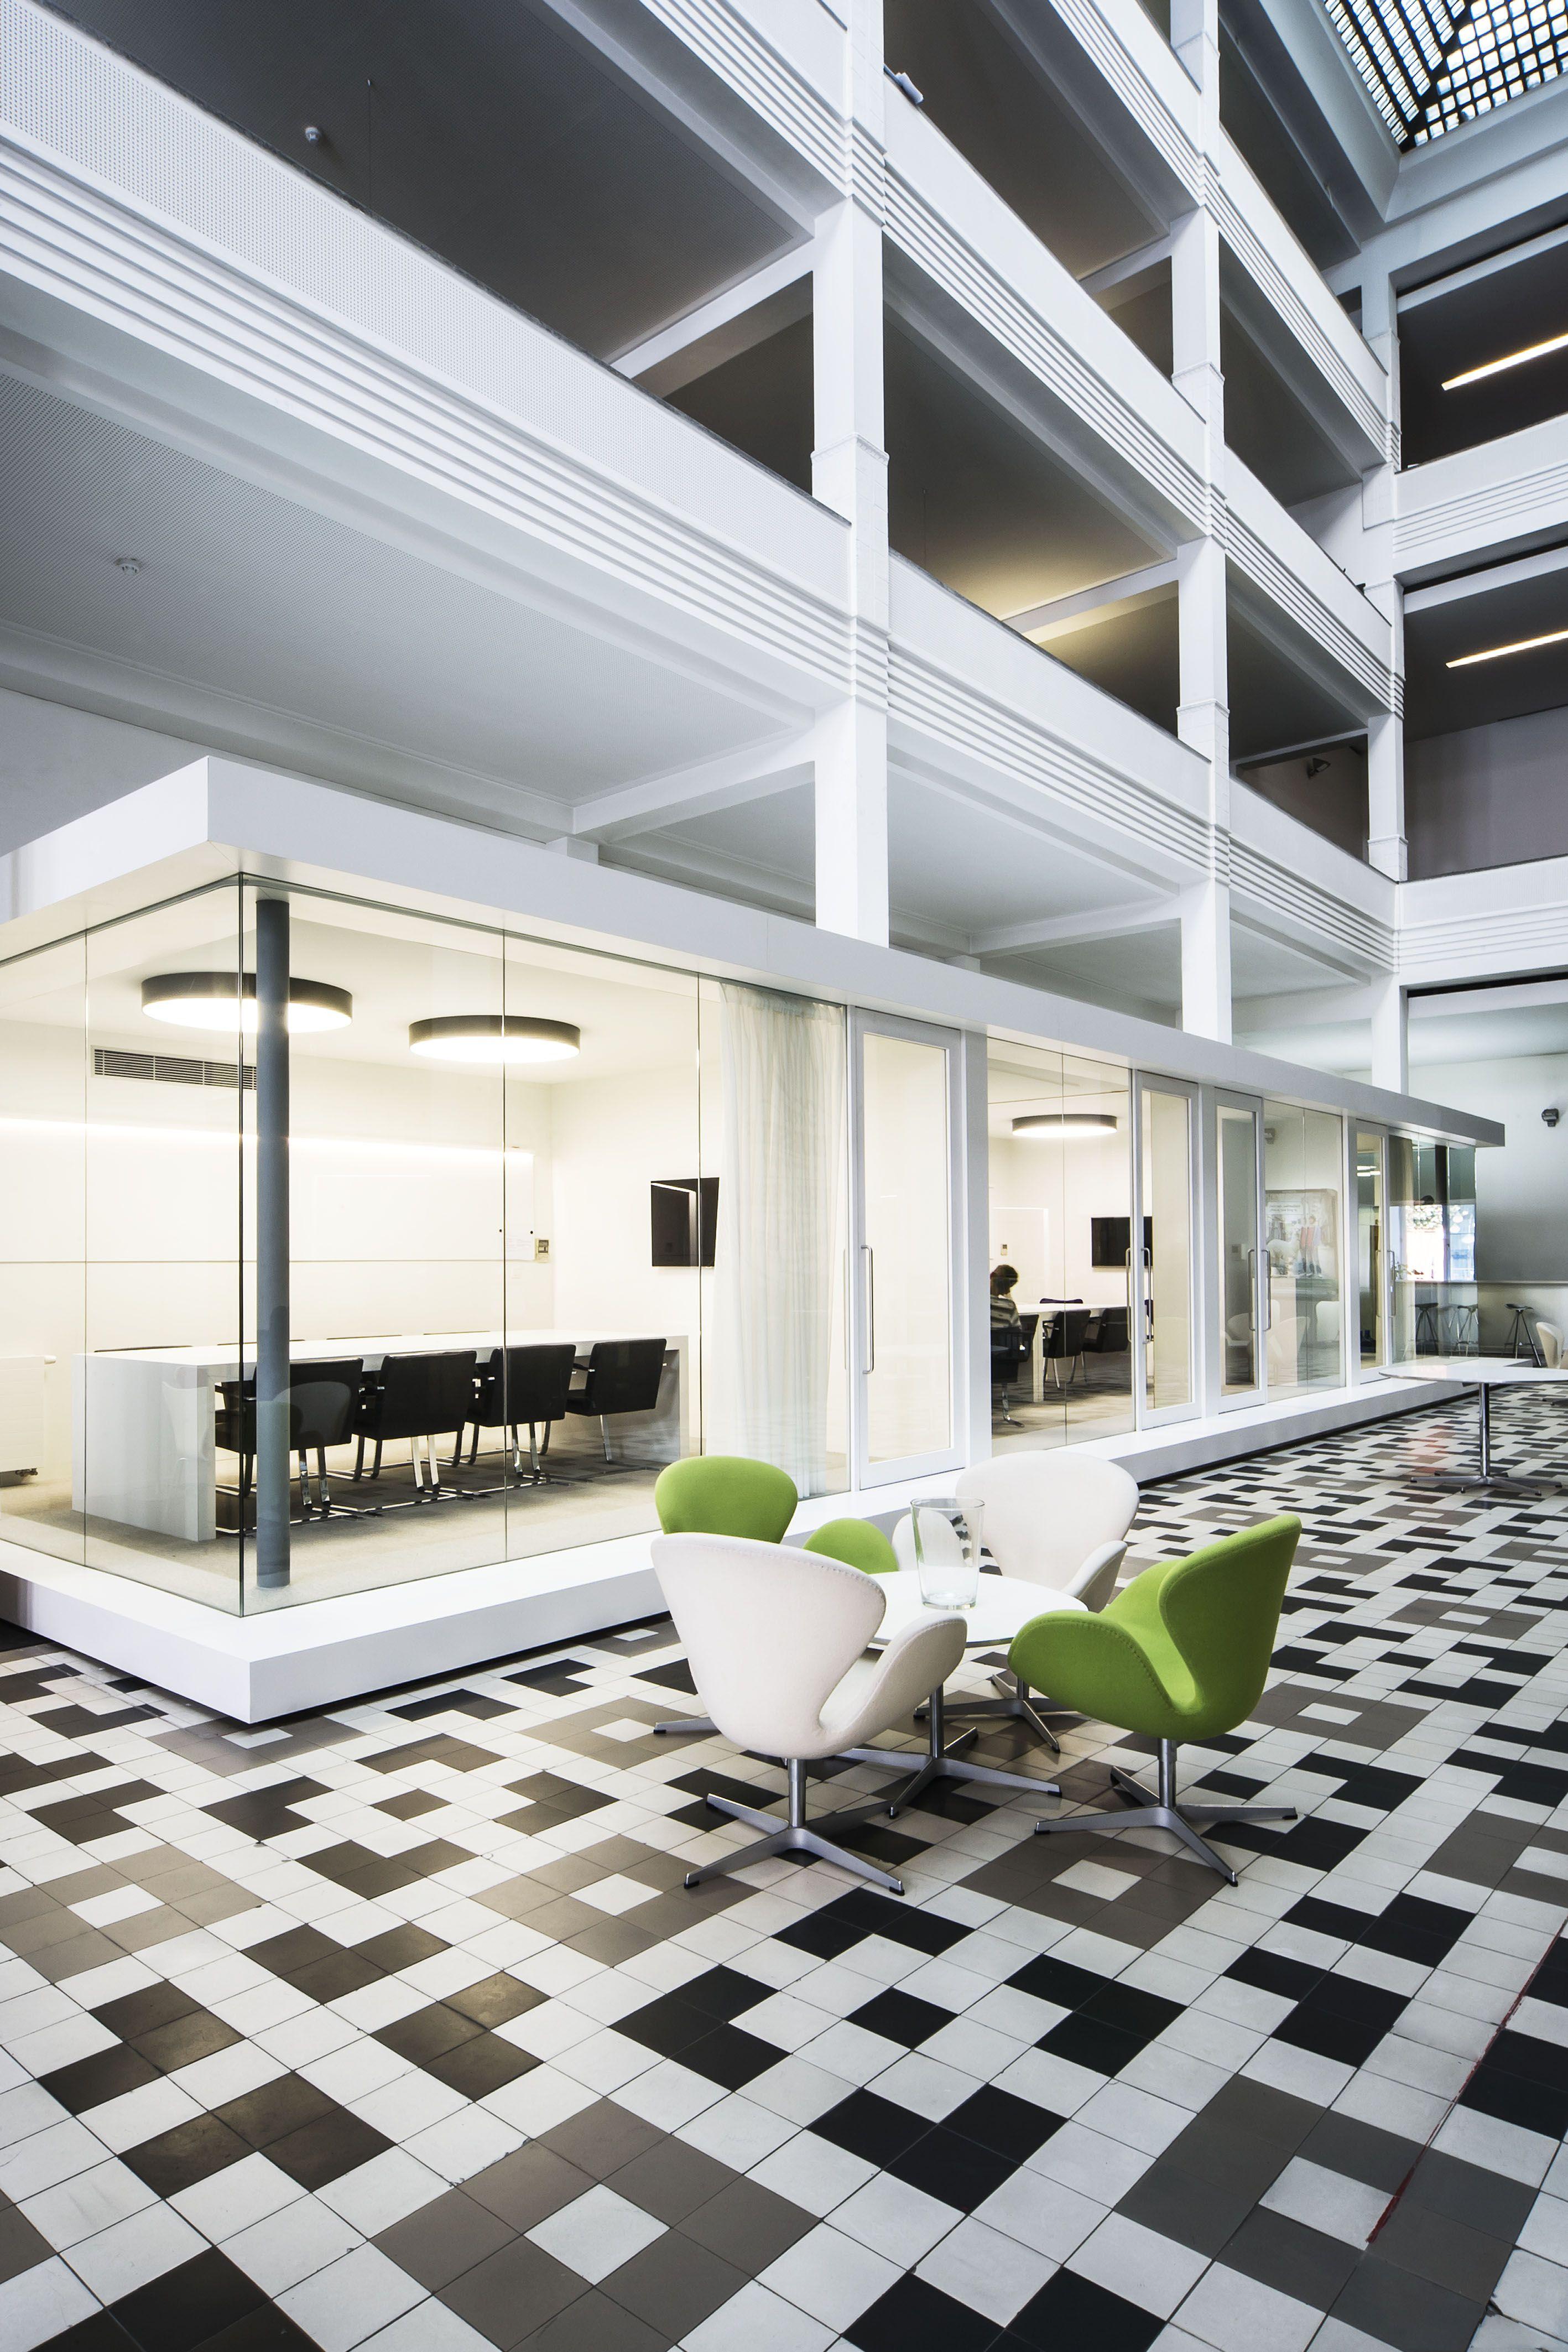 LEO BURNETT OFFICE DARK HOEK Prolicht SIGN s black & white architecturallighting project at Brussel BE fice space Офисы